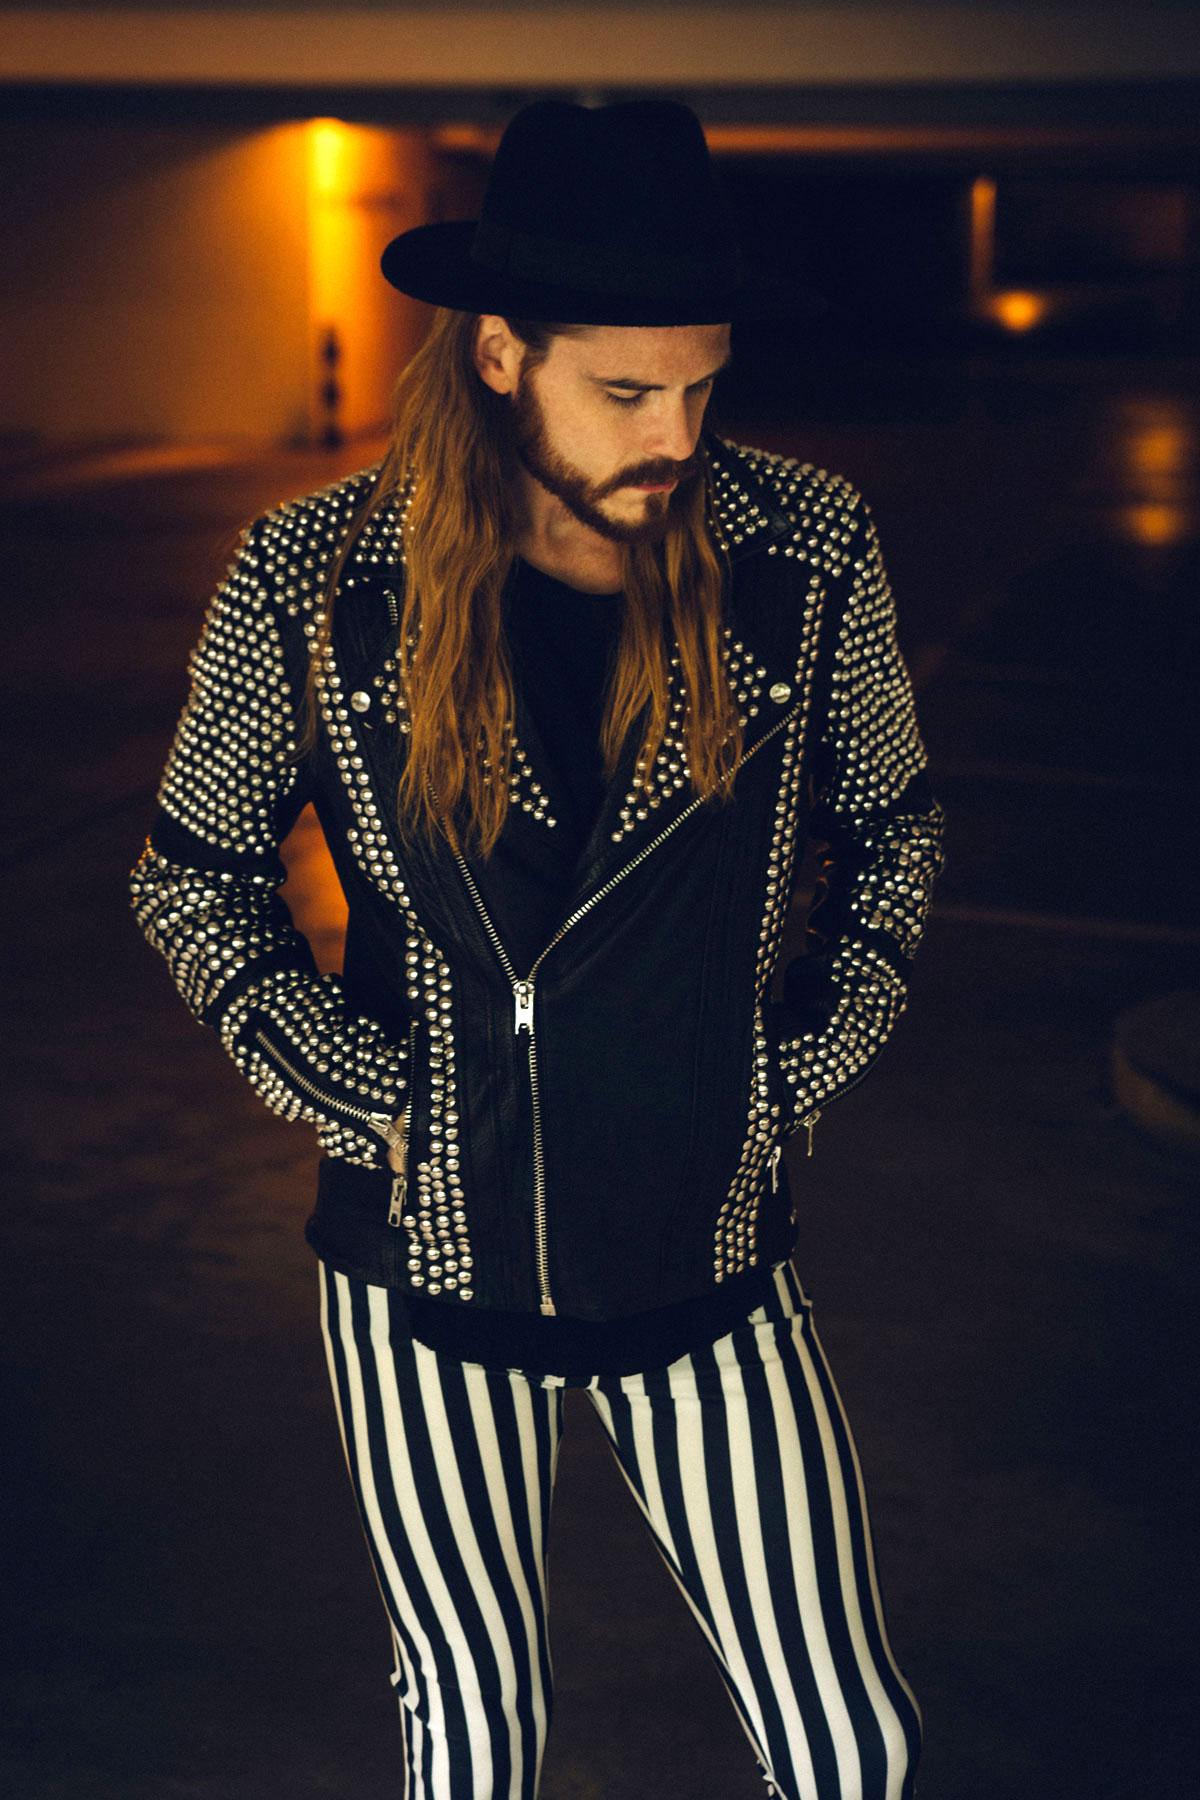 Maennermodeblog-Meggins-Lederjacke-Nieten-tigha-Rockstar-Hut-Fashion